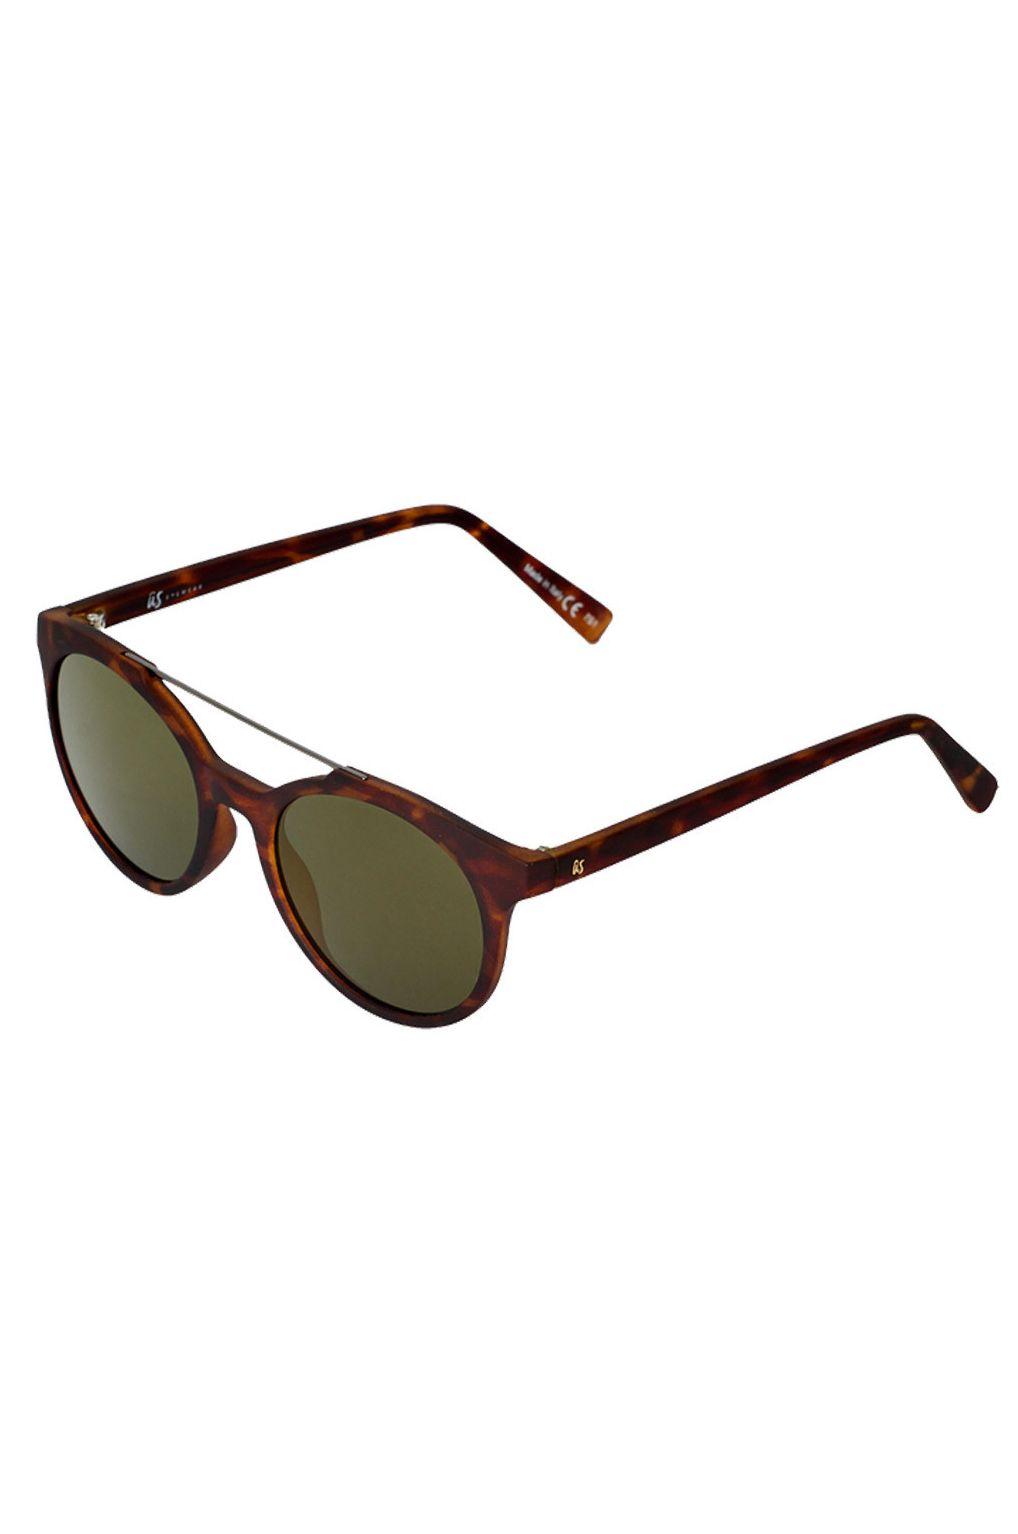 US Sunglasses CALIX Matte Tort/Grey Gold Chrome